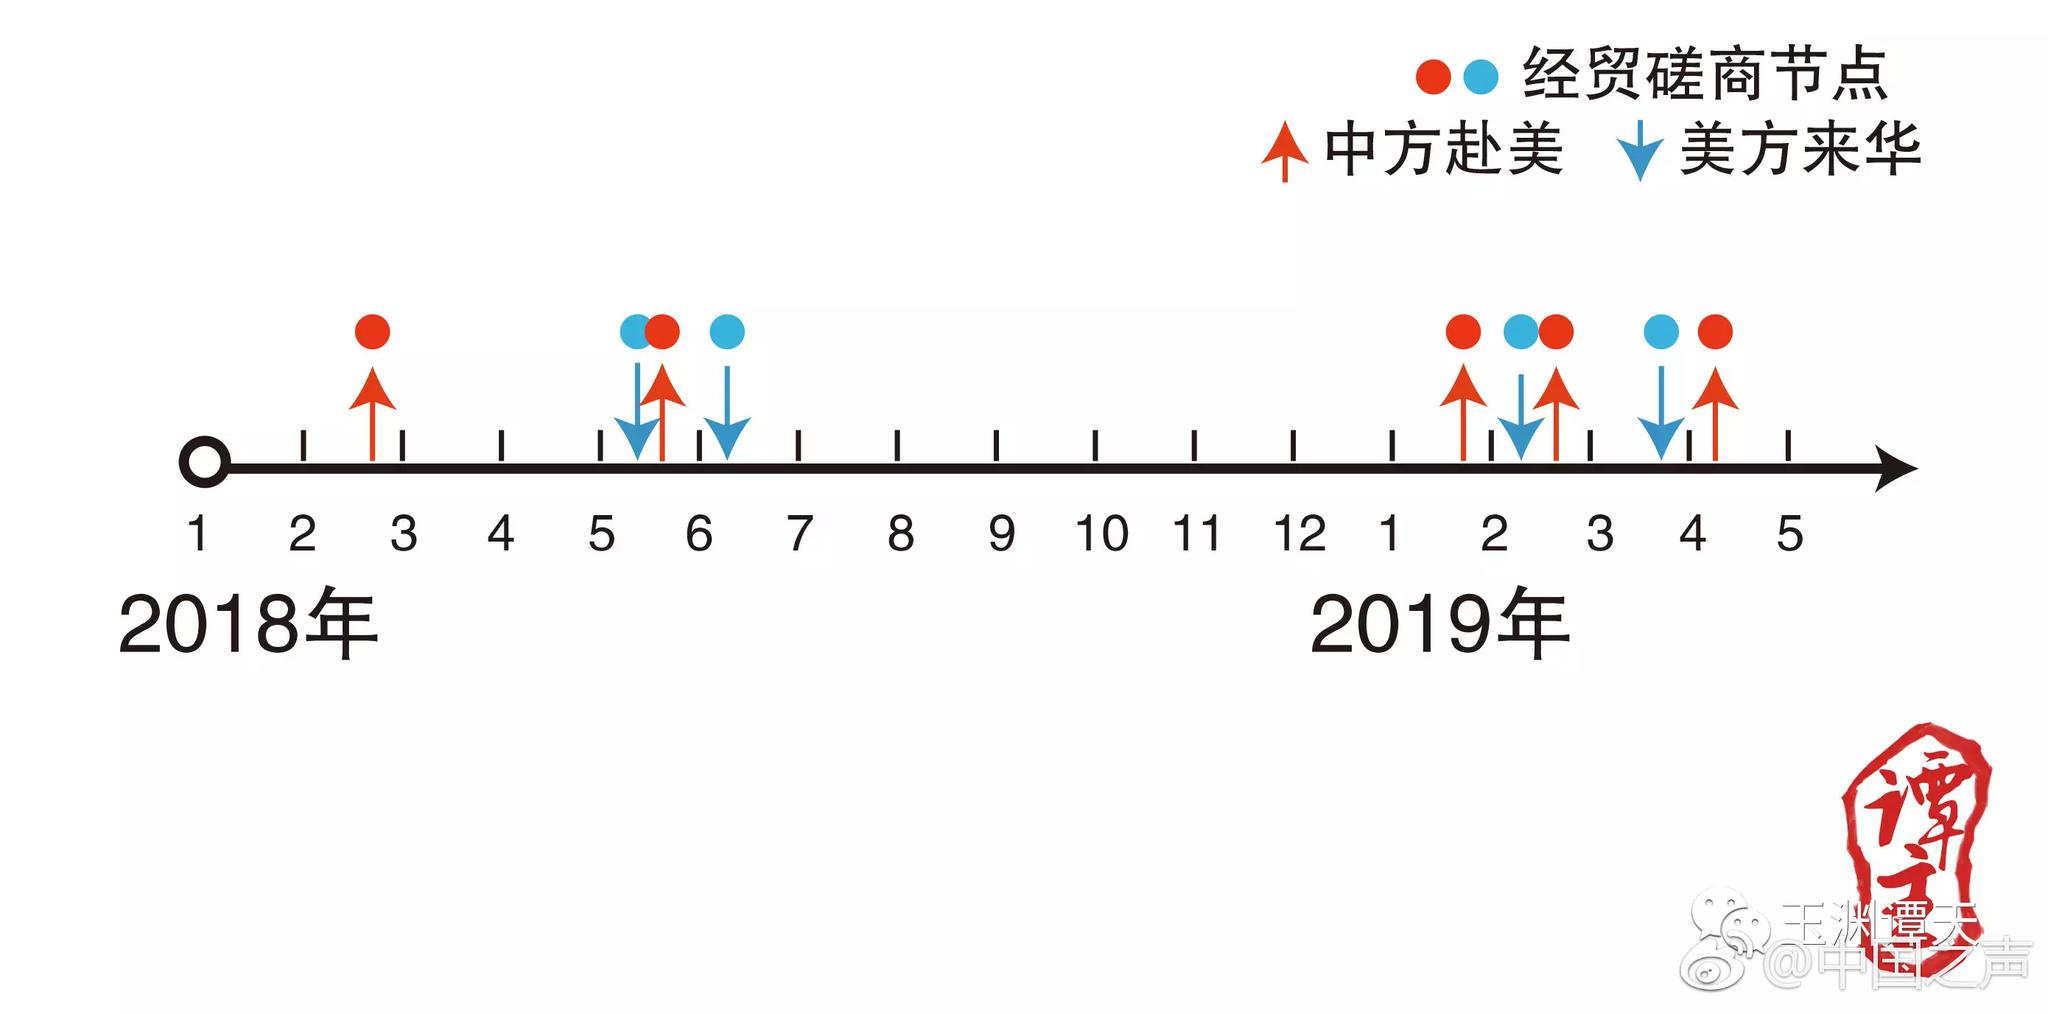 2016gratisbideos中国